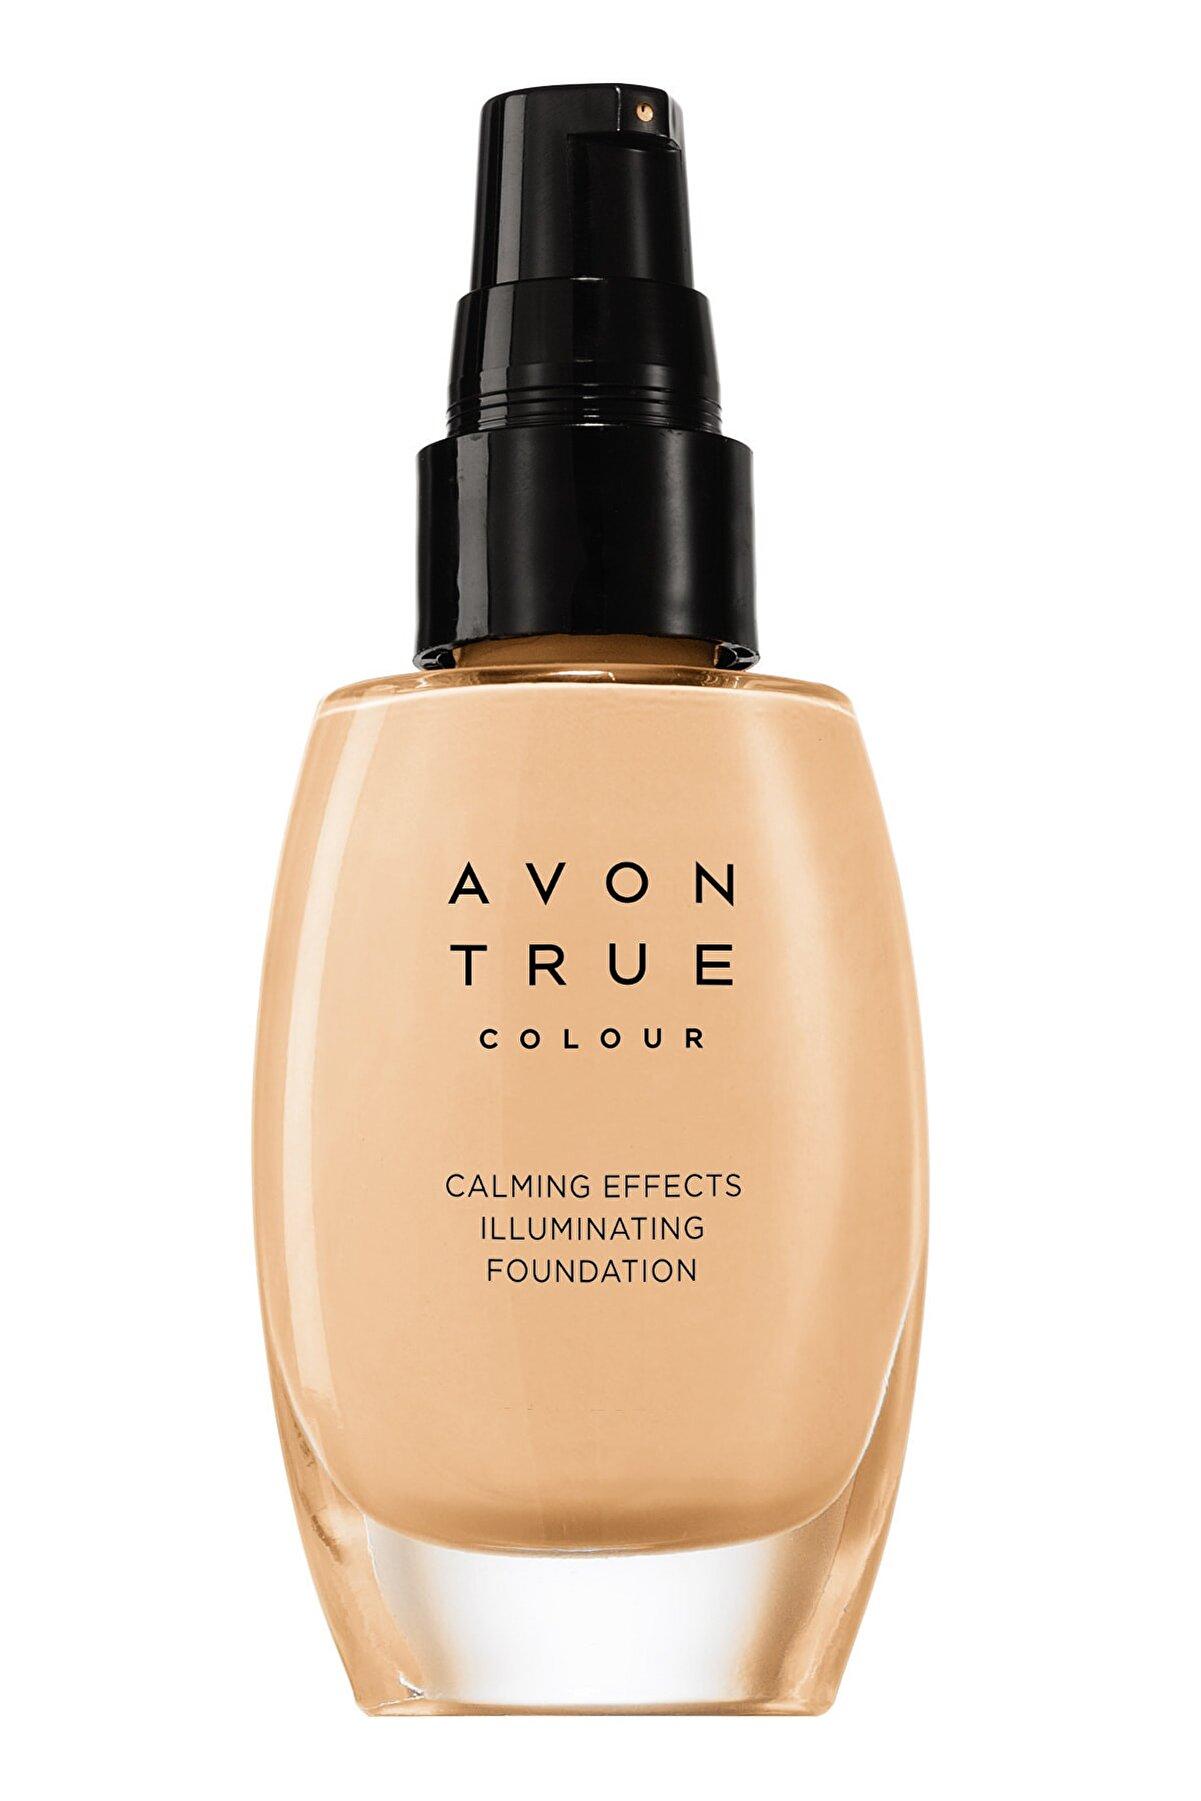 Avon Işıltı Veren Fondöten - Calming Effects Illuminating Foundation Ivory 30 ml 8681298930303